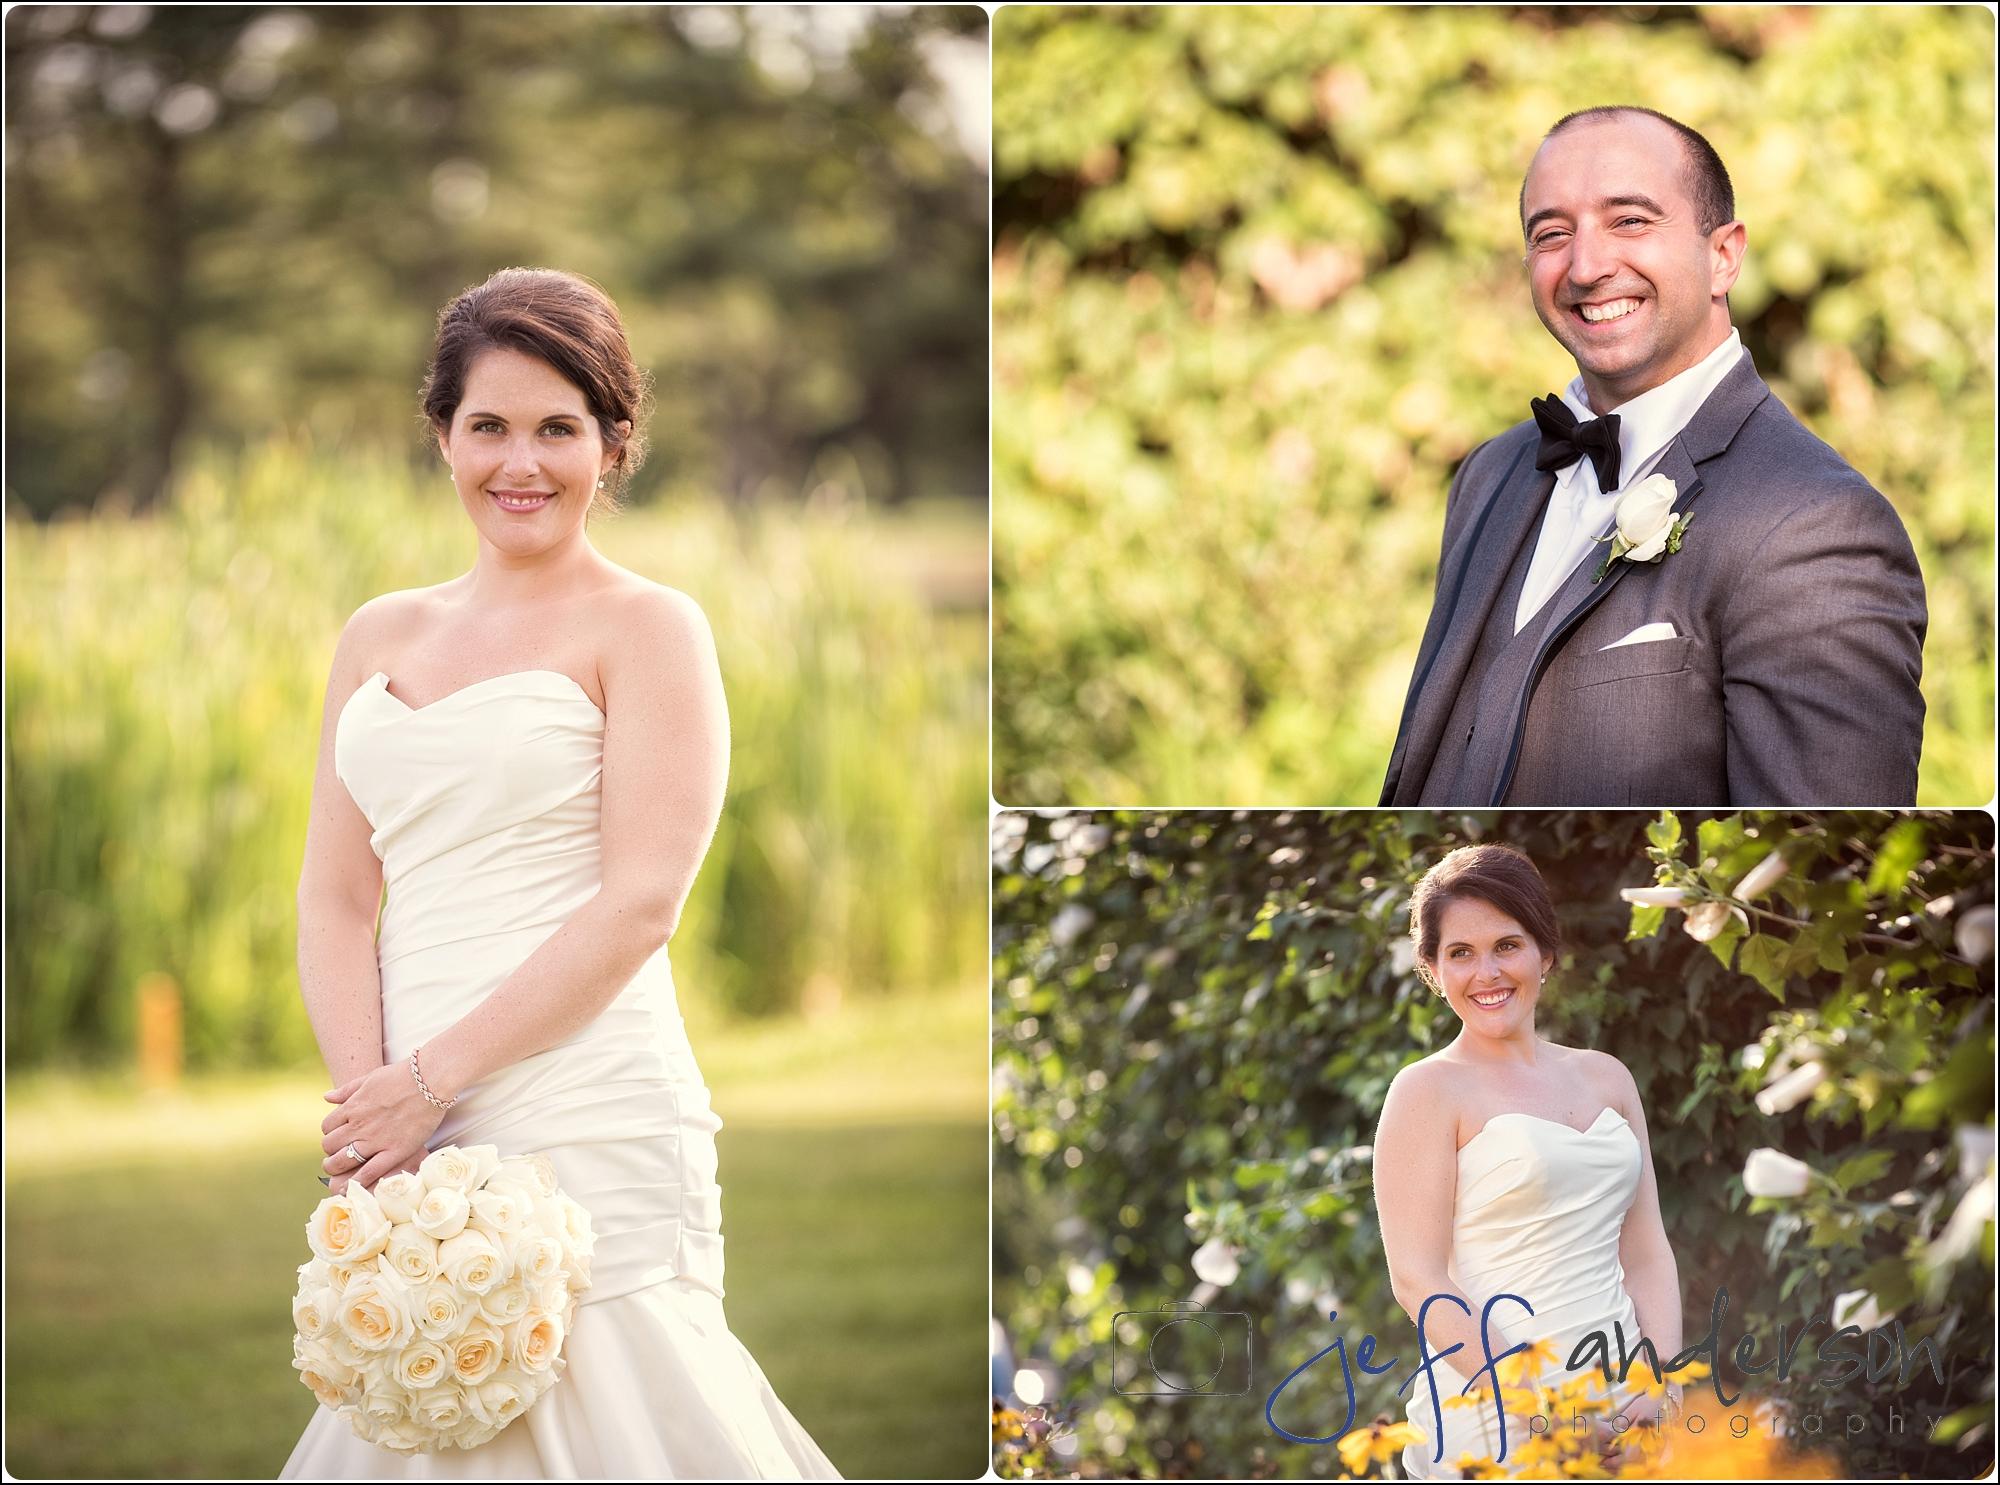 destination wedding photographer,jeff anderson photography,marissa_chris,old york country club,philadelphia wedding photographer,south jersey wedding photographer,wedding photography,